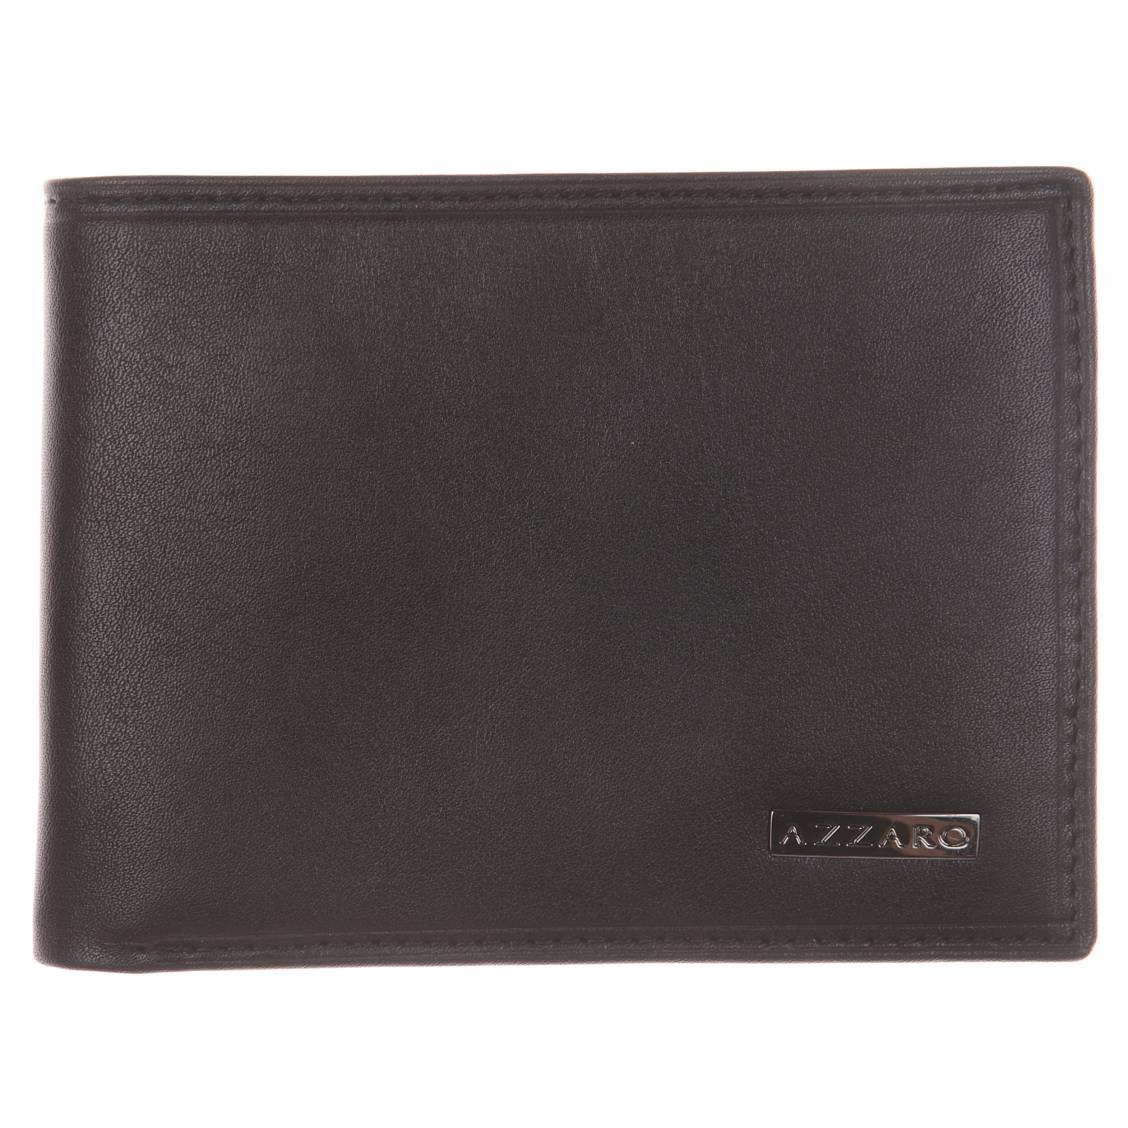 portefeuille italien Azzaro en cuir noir